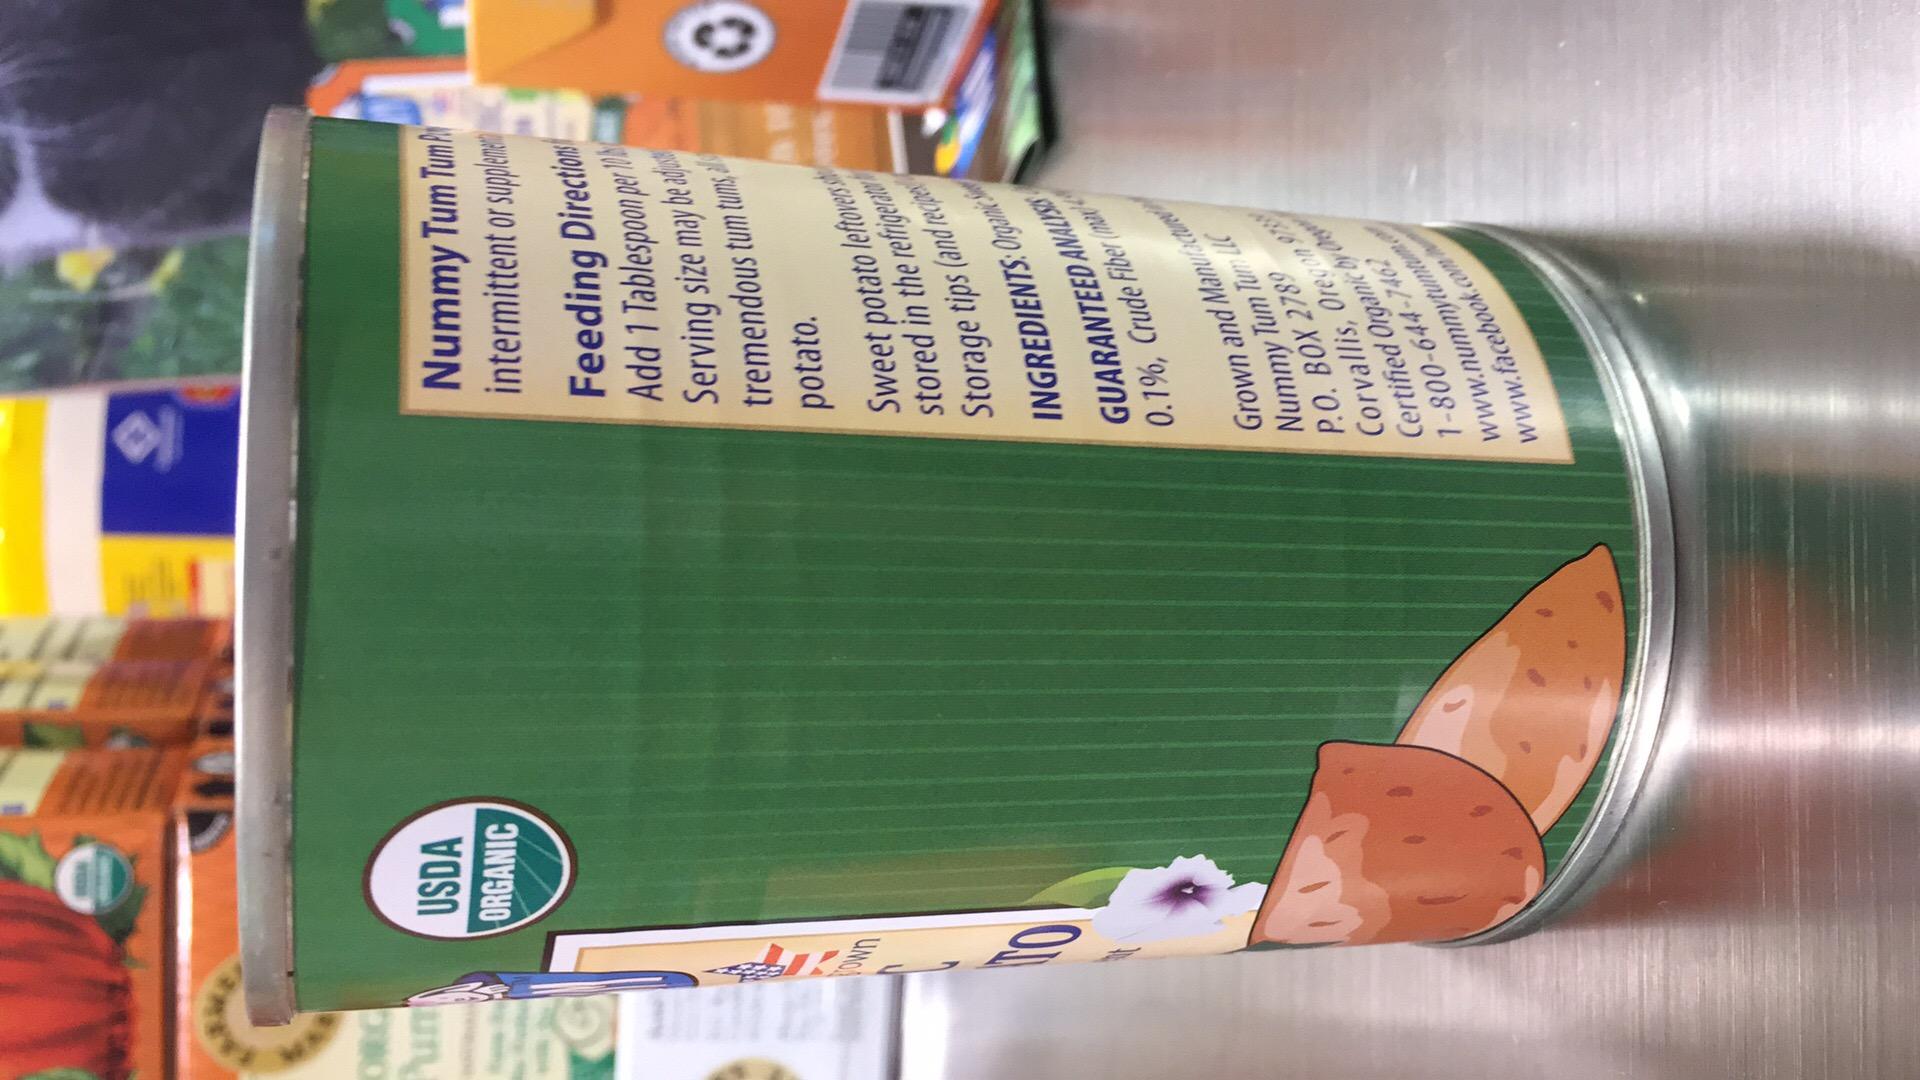 ... Organic Sweet Potato Pet Food Supplement For Dogs ... & Organic Sweet Potato Pet Food Supplement For Dogs u0026 Cats | The ...